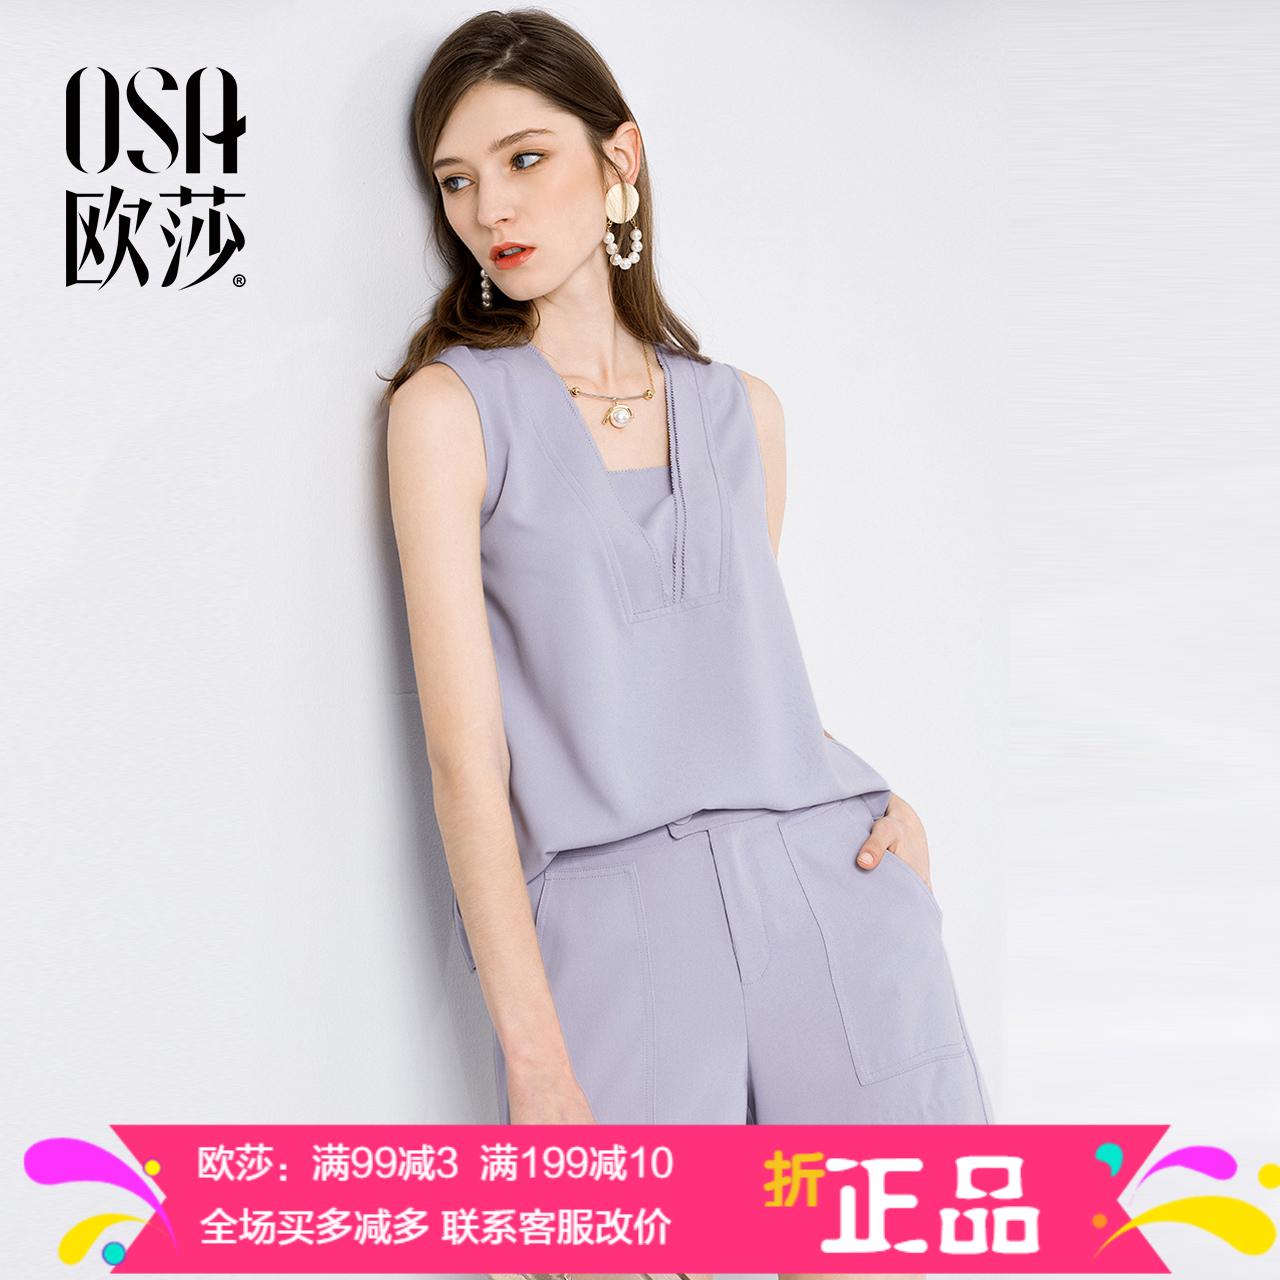 ⑩OSA欧莎2018夏装新款女装  气质干练简约时两件套套装B15005